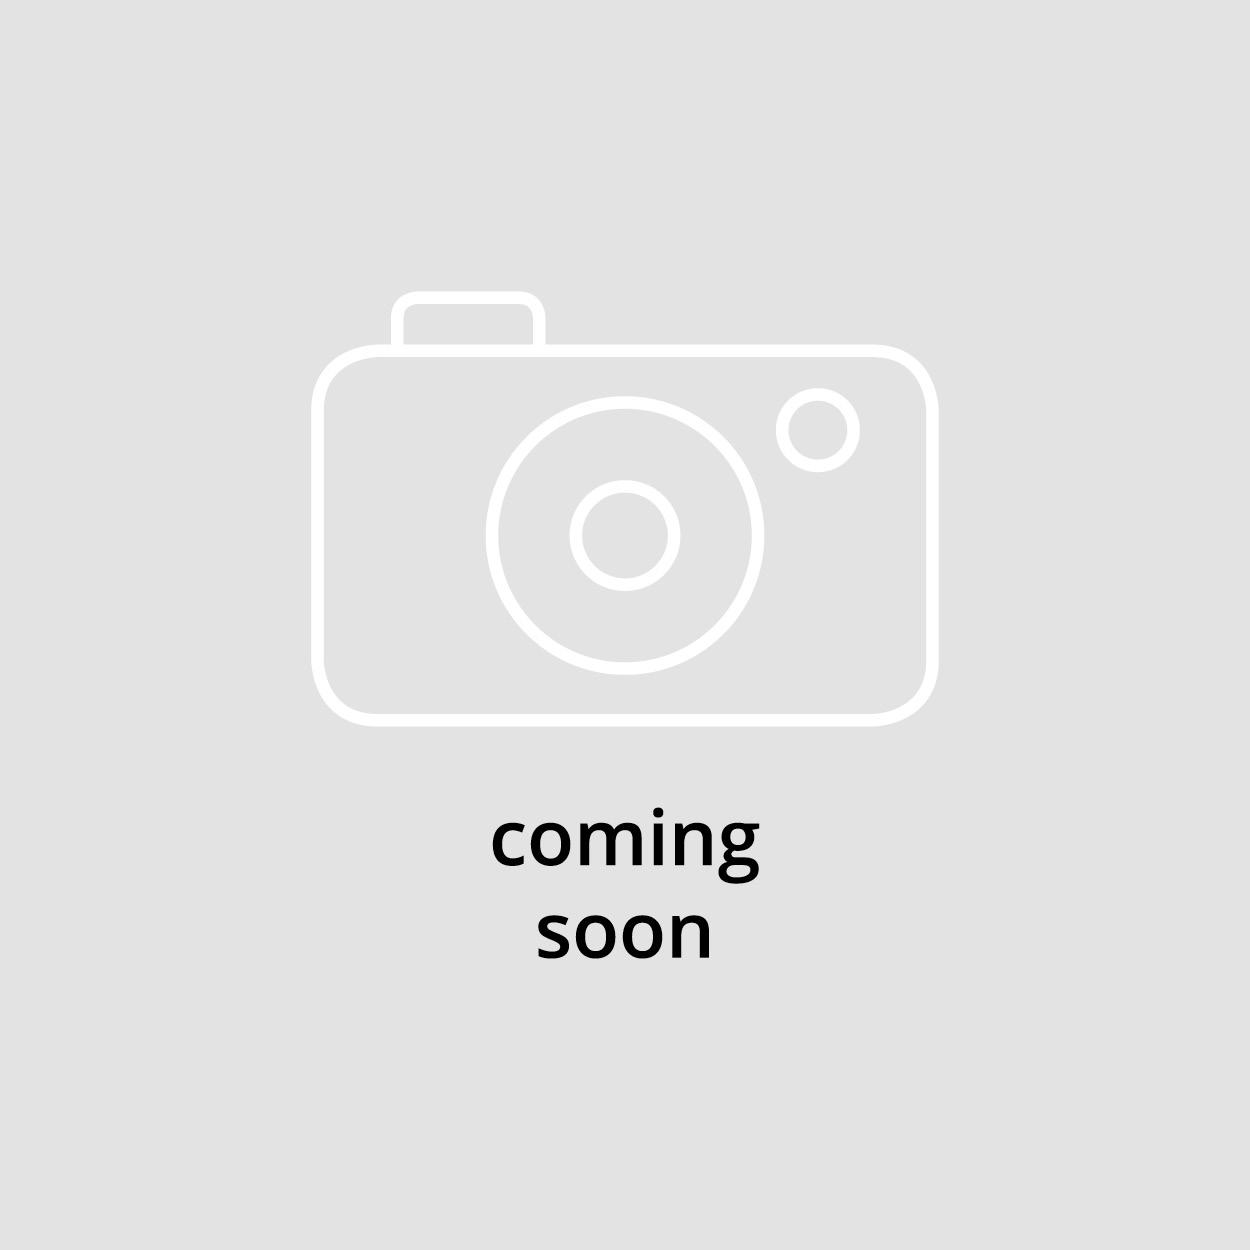 880100 Portautensile prismatico piatto per Gildemeister IMIS08, AS20, GS20, GM20, GM20AC